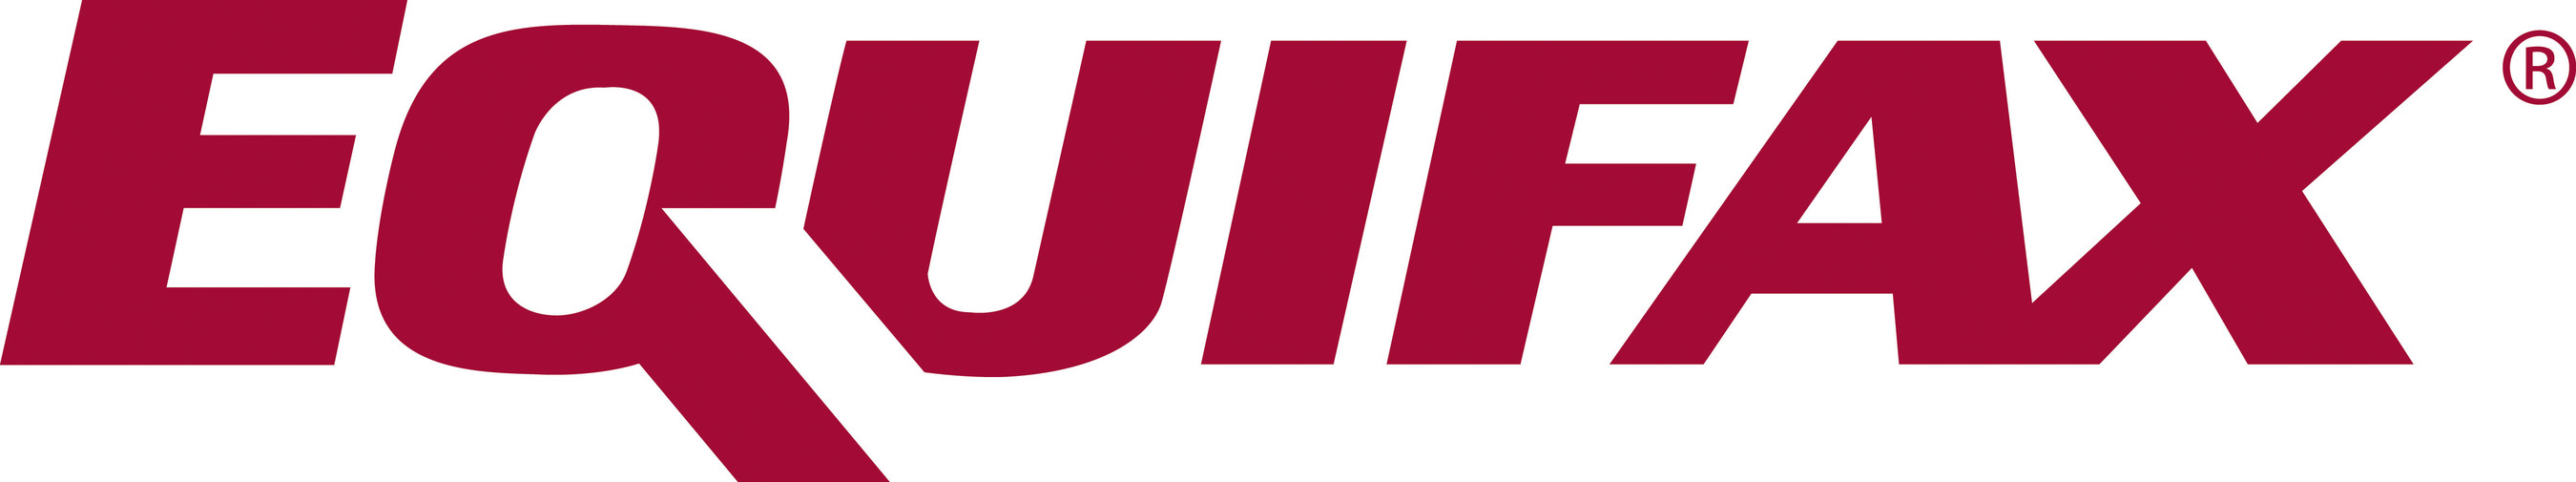 Equifax Inc. logo